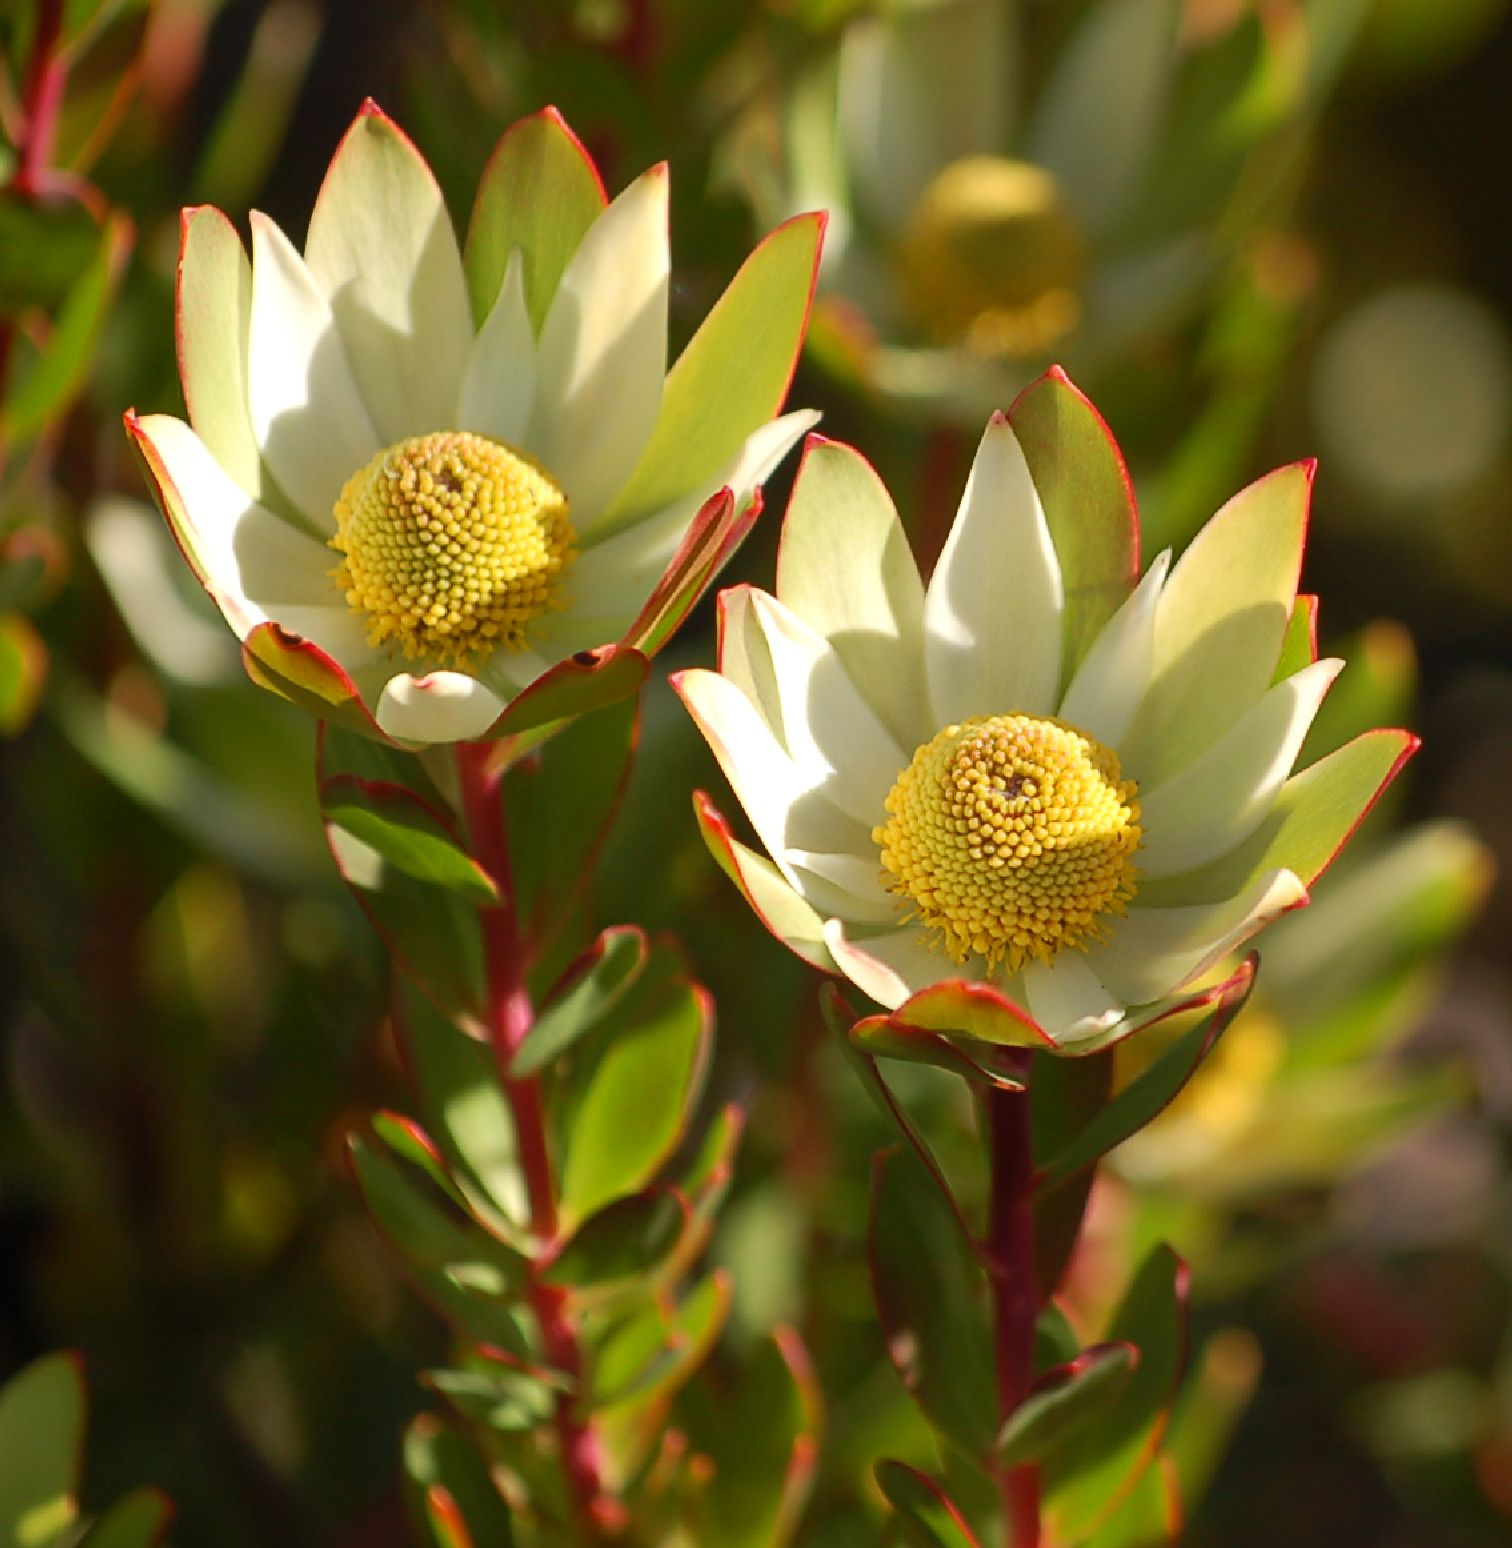 Gold Cup Flower photos, Australian flowers, Beautiful